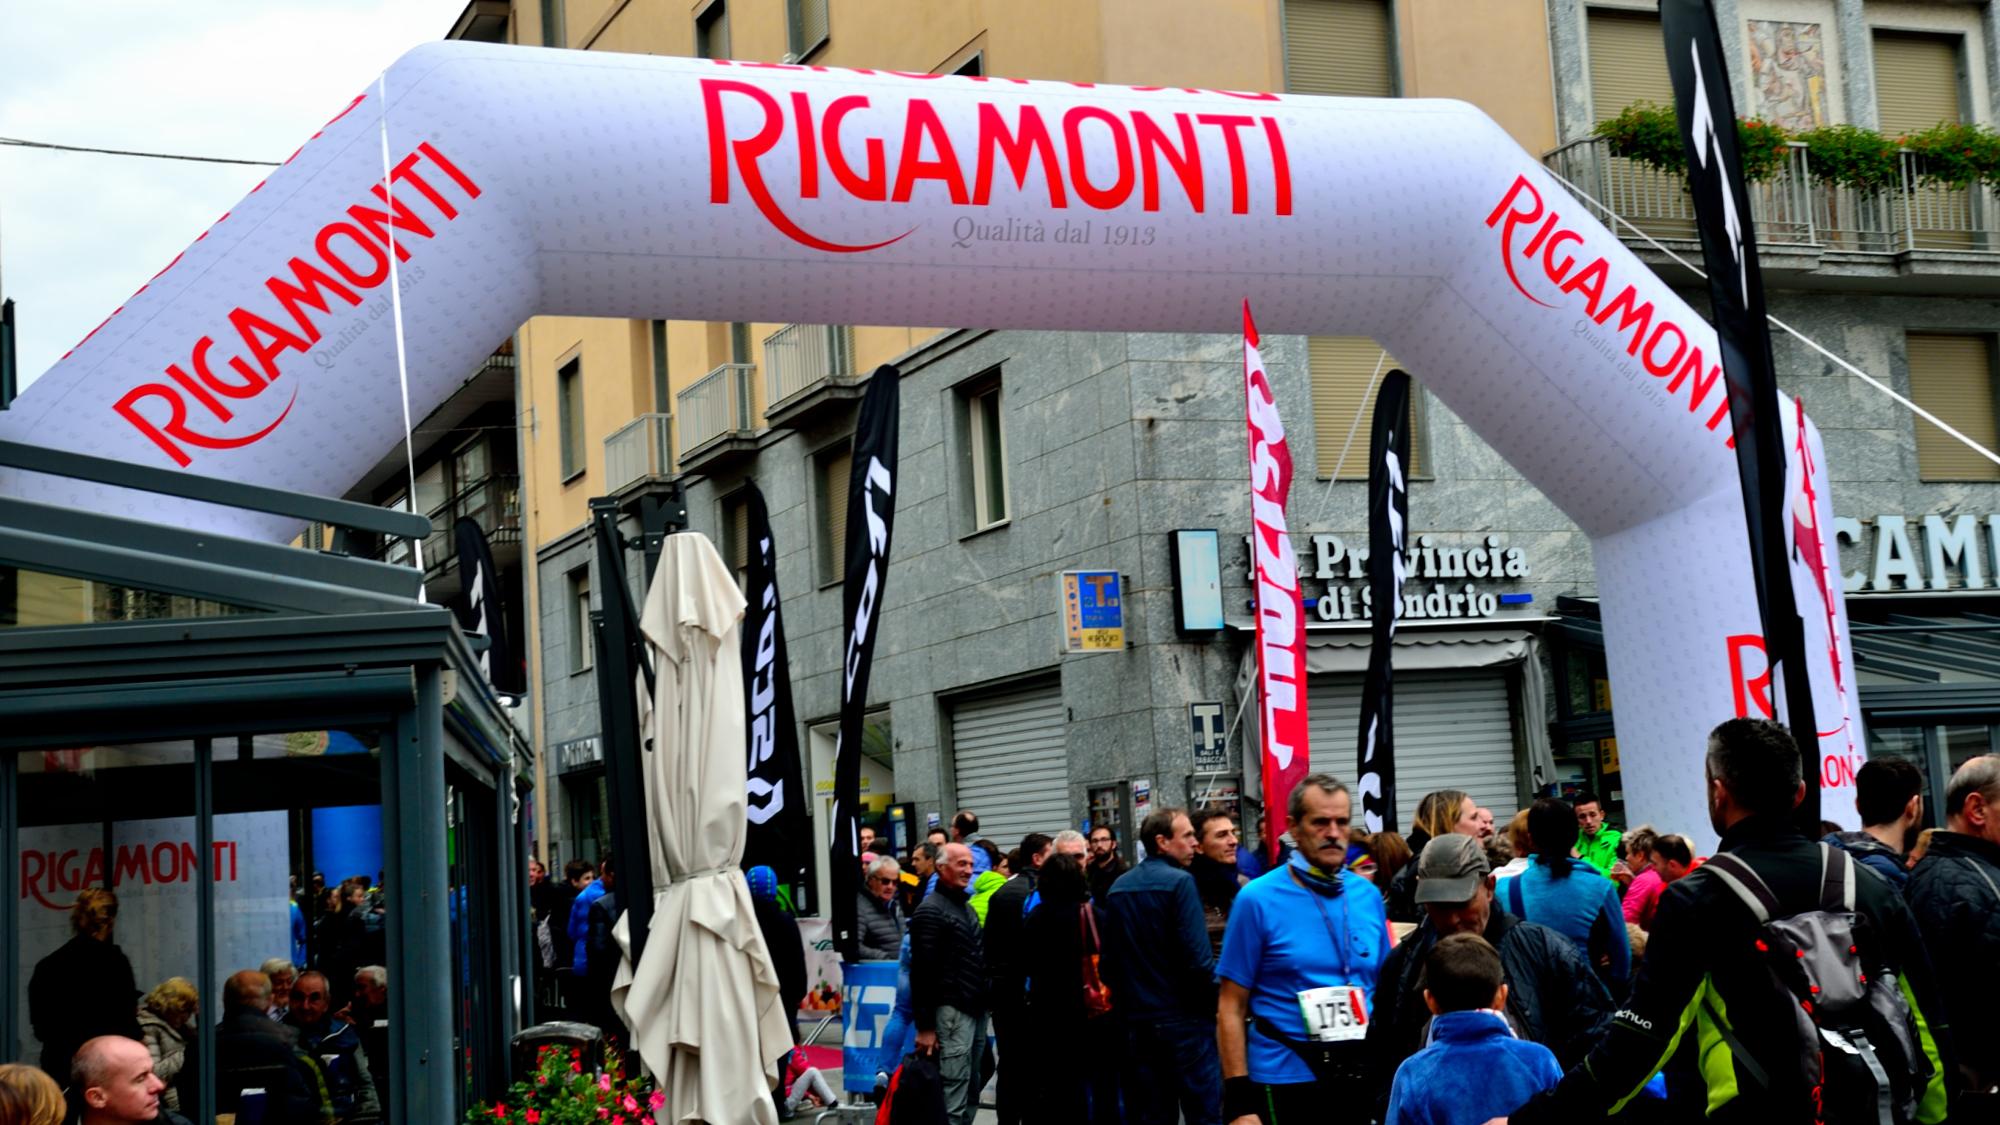 Valtellina Wine Trail Rigamonti